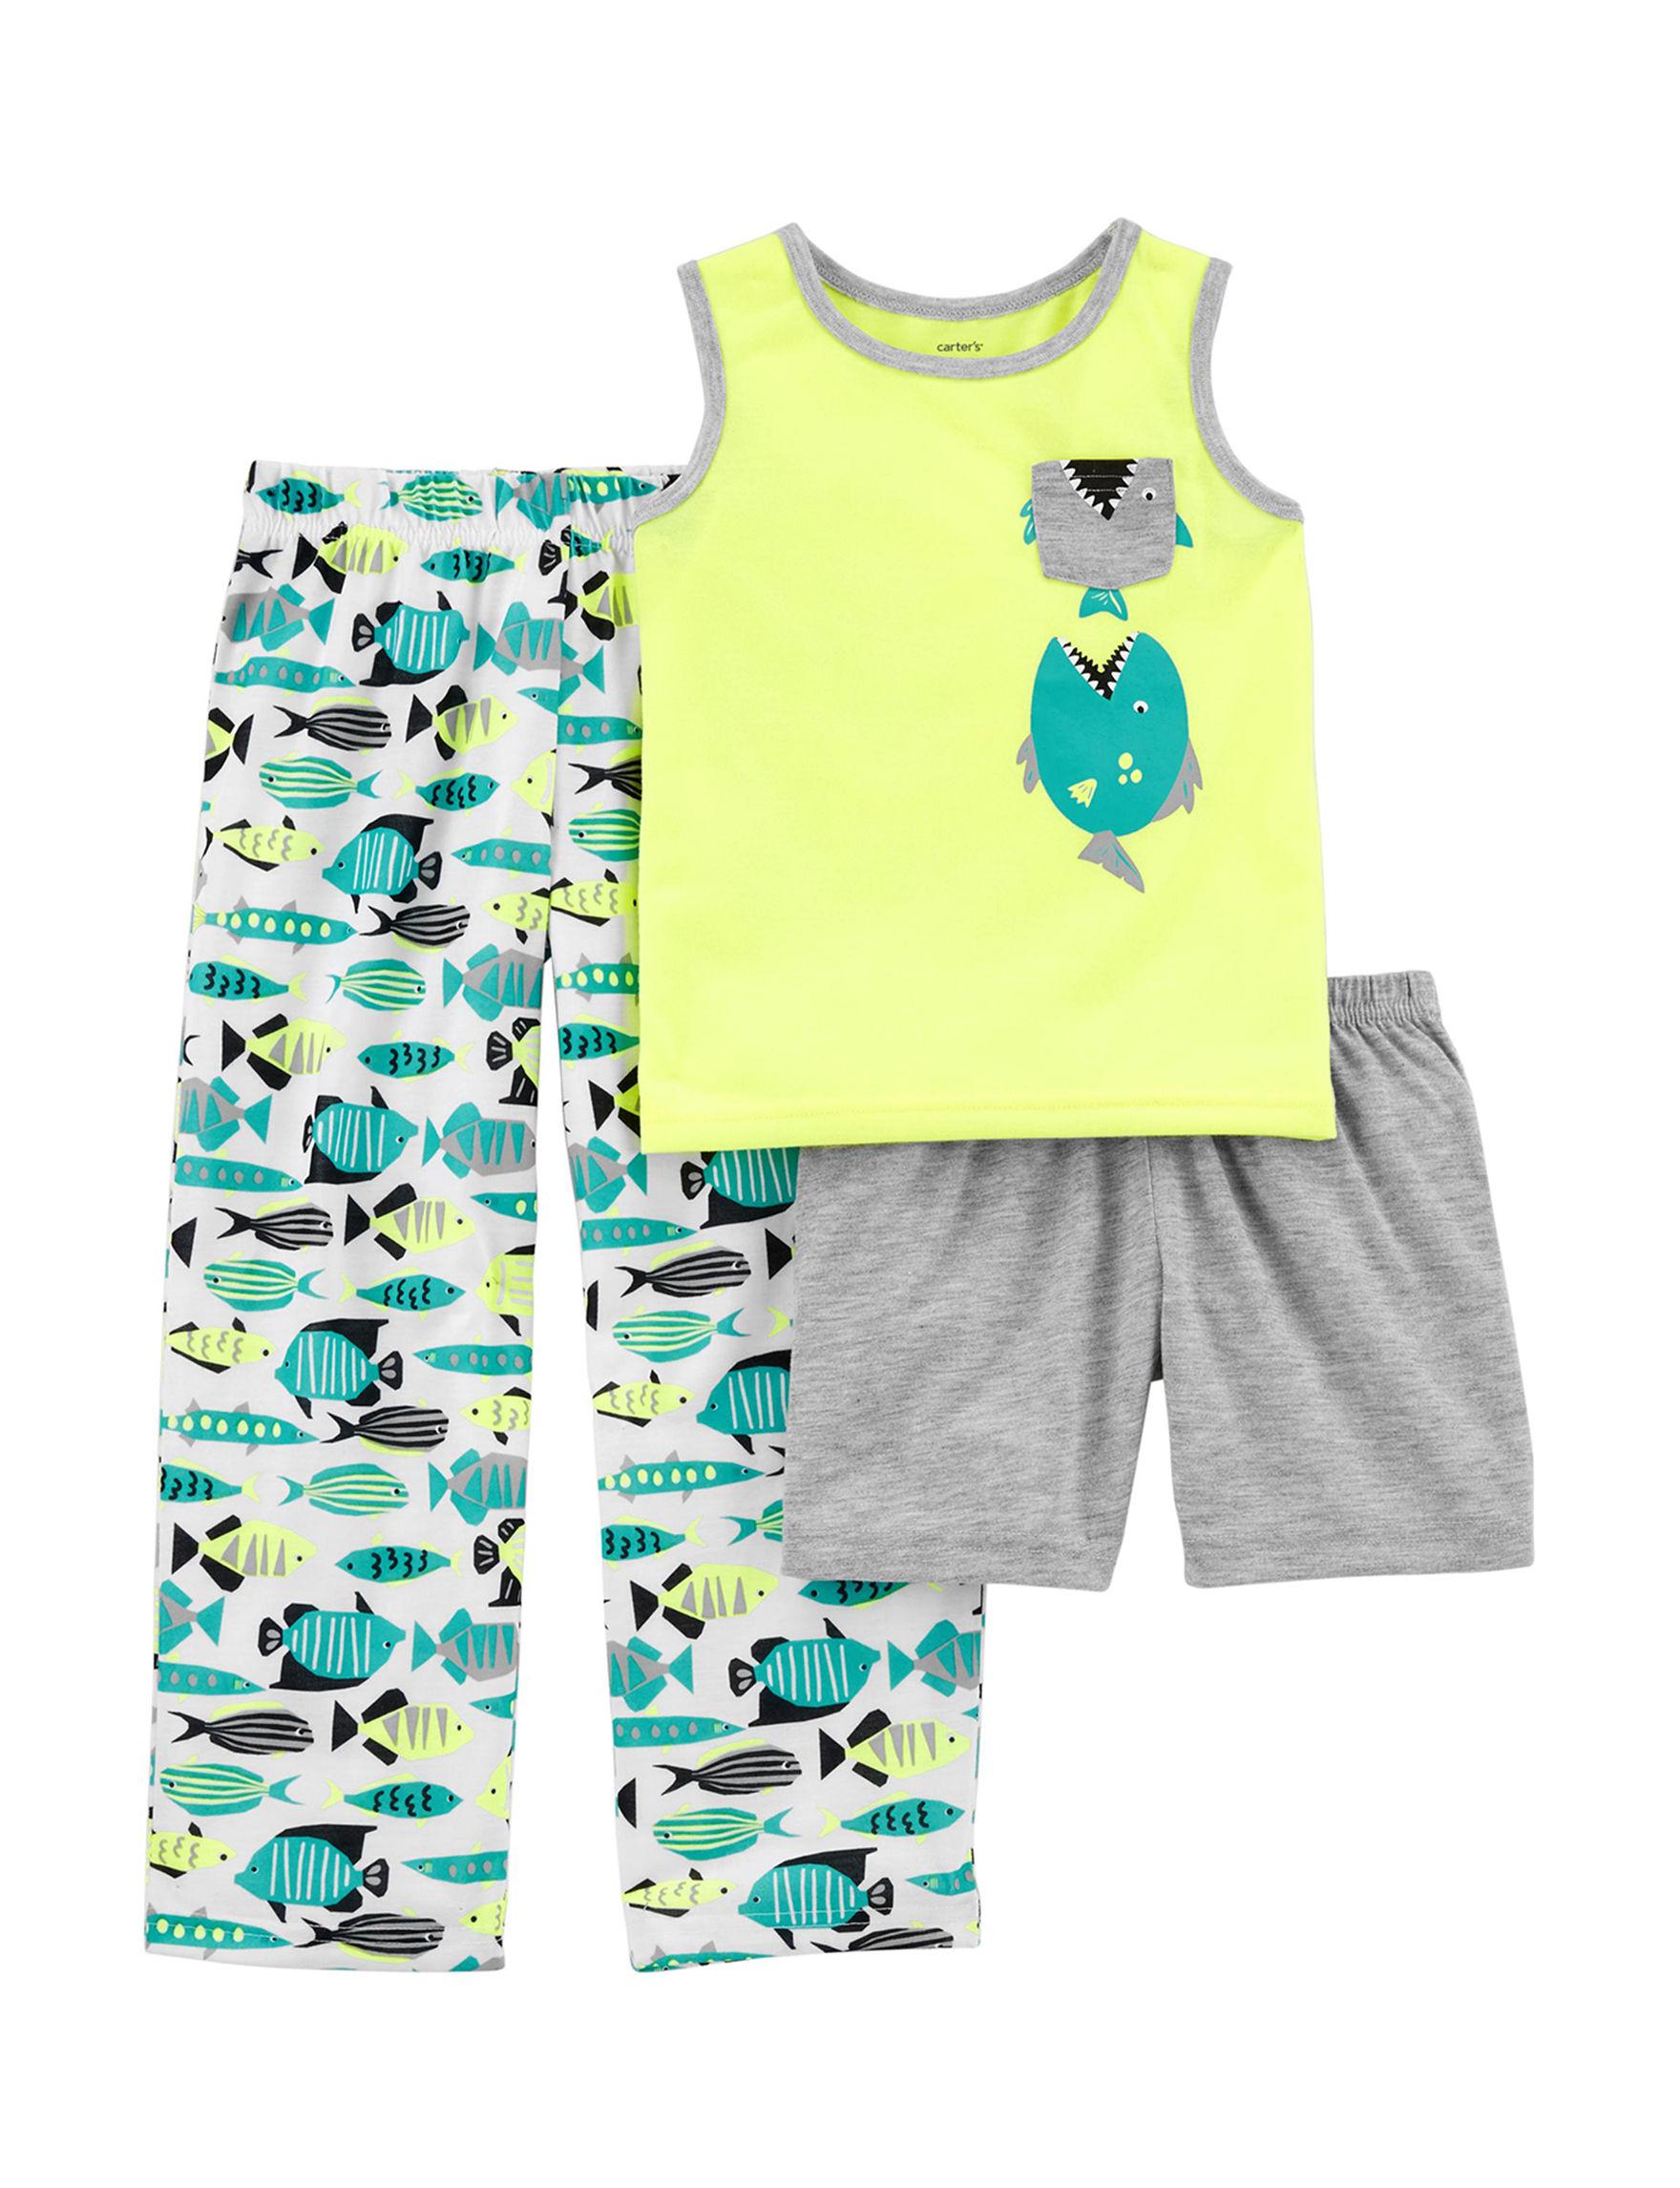 Carter's Yellow / Turquoise Pajama Sets